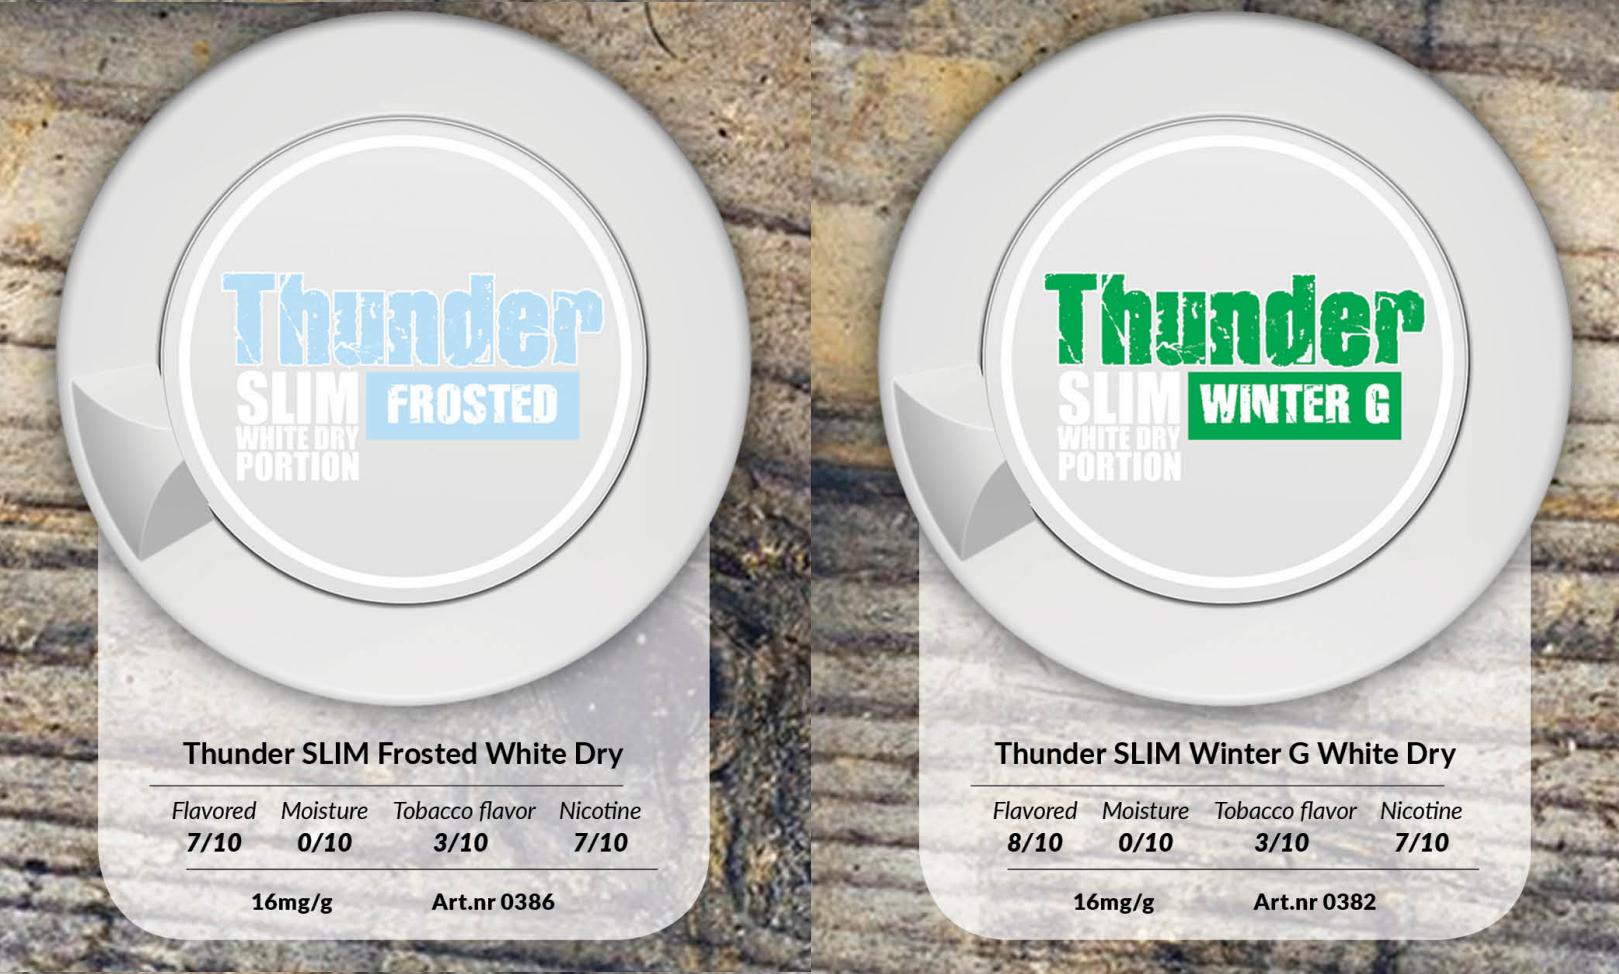 Thunder Slim